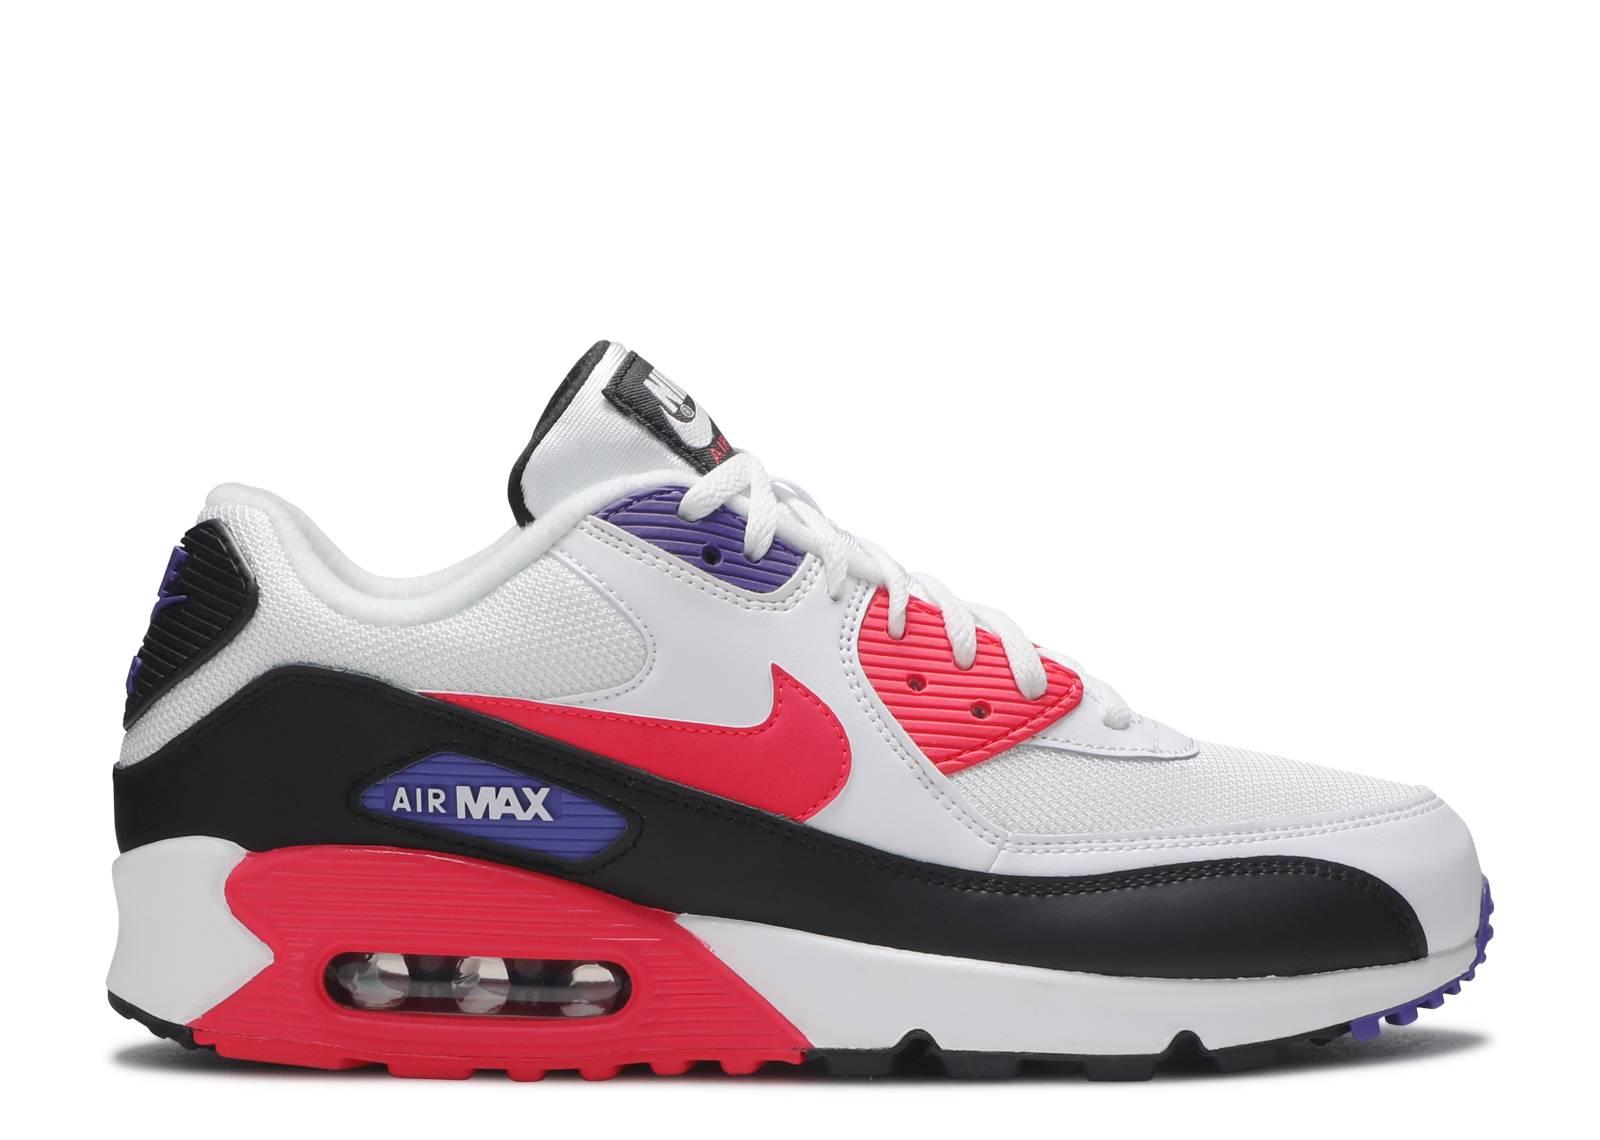 Nike Air Max 90 Men's & Women's Shoes | Flight Club